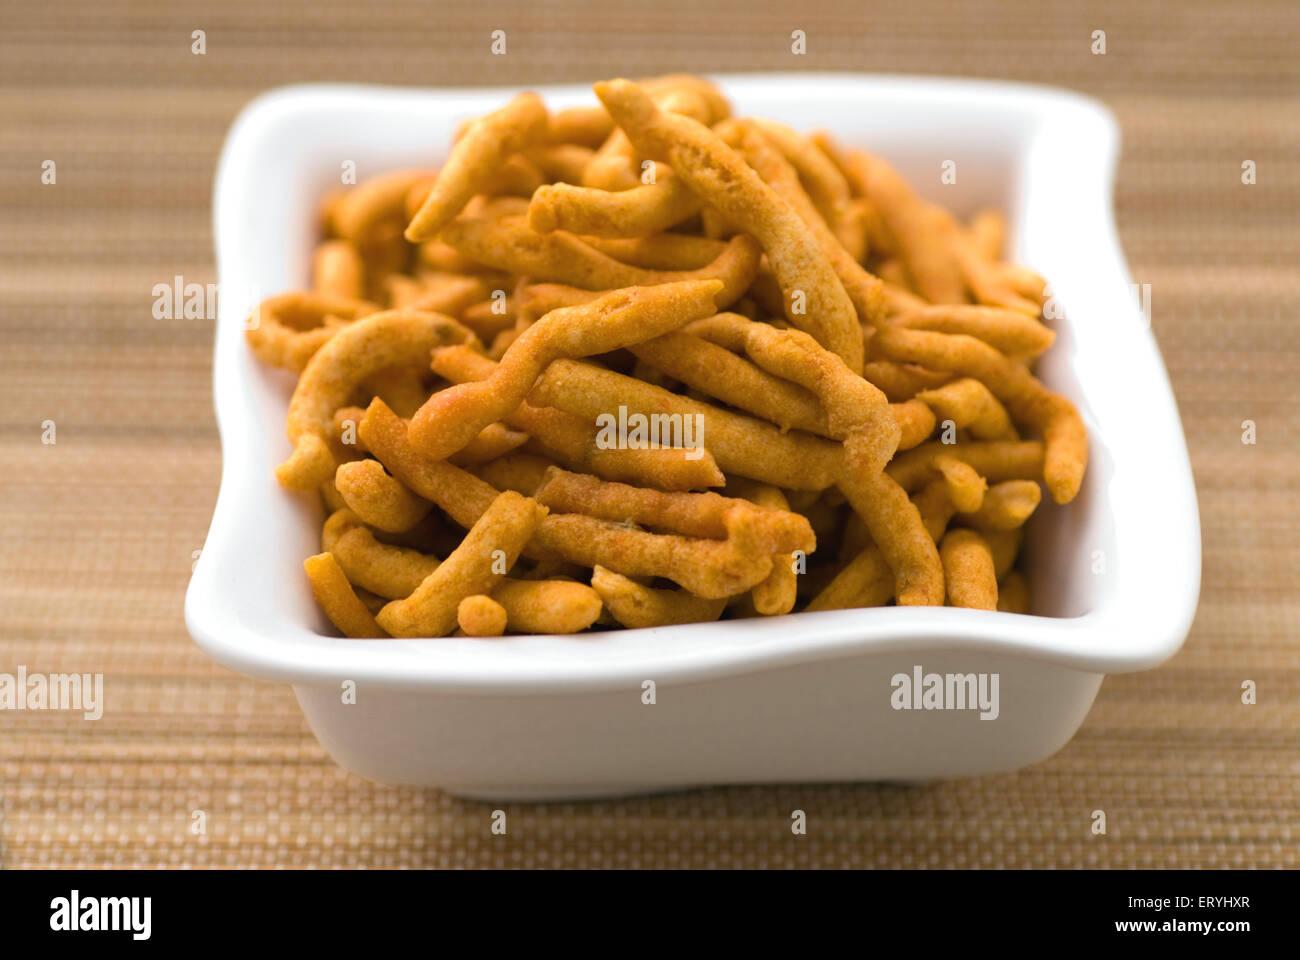 Des collations; farine de gramme fried spicy sev dans le bac Photo Stock